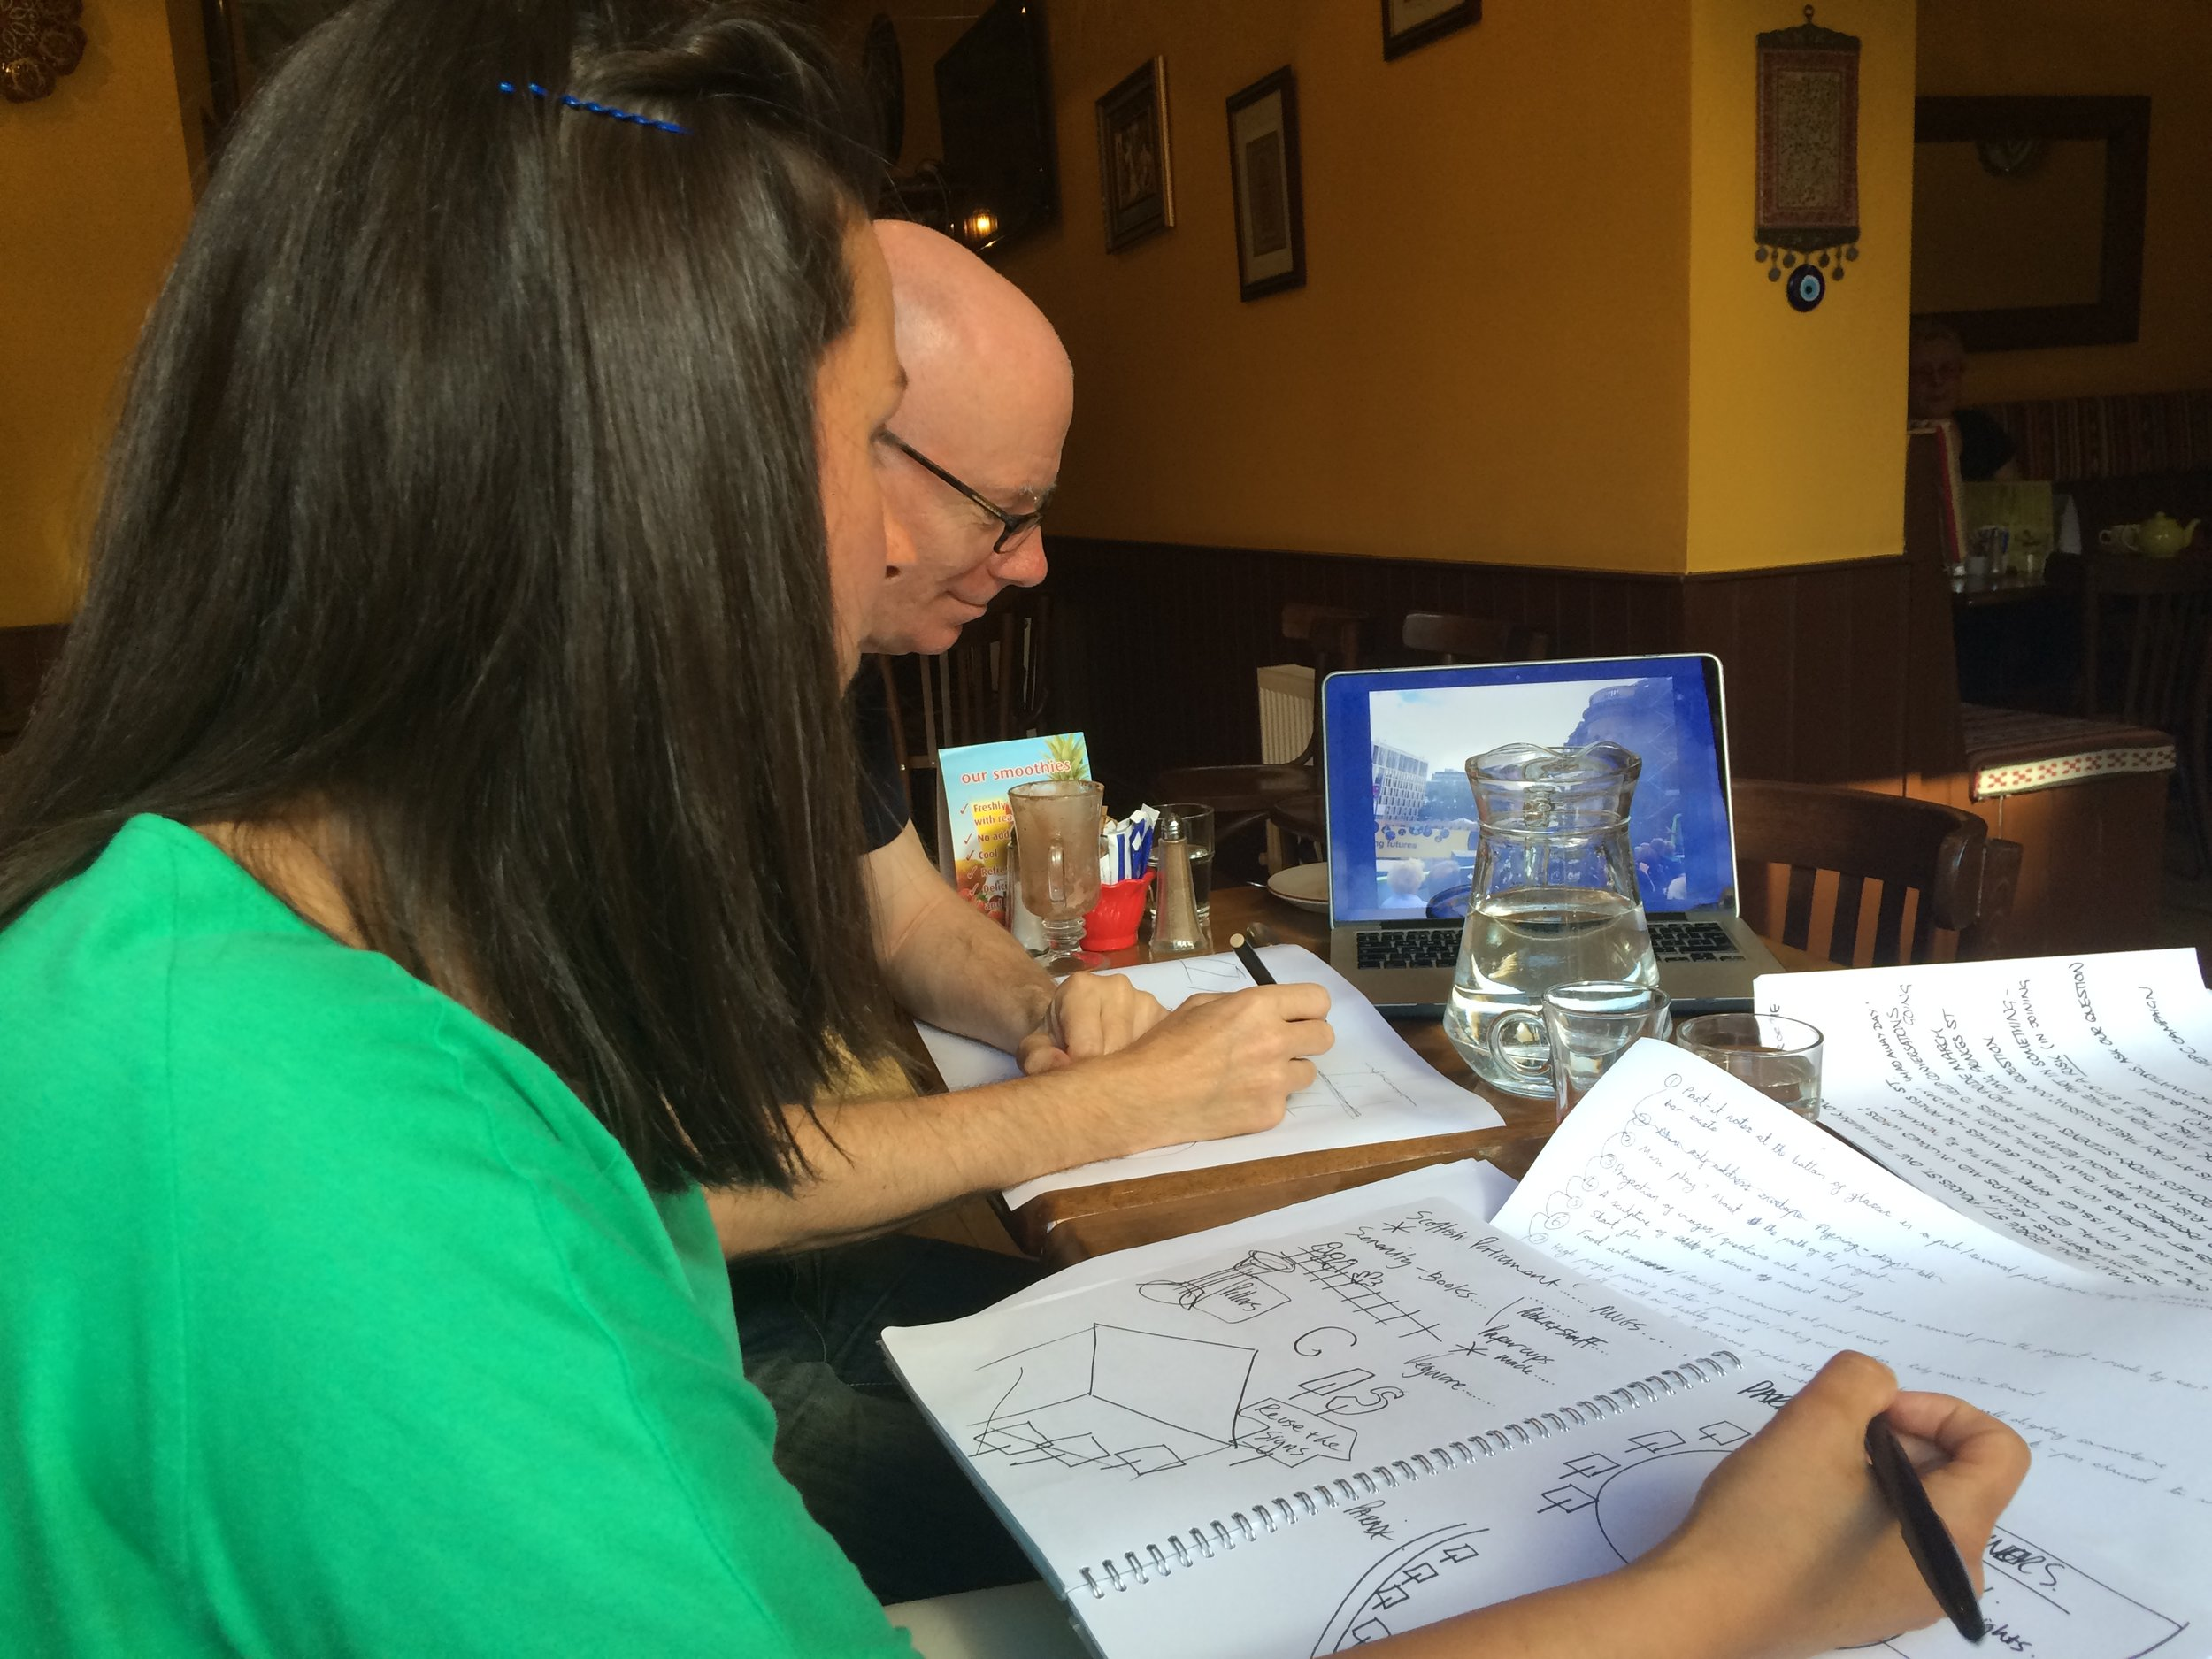 A Creative Team planning meeting